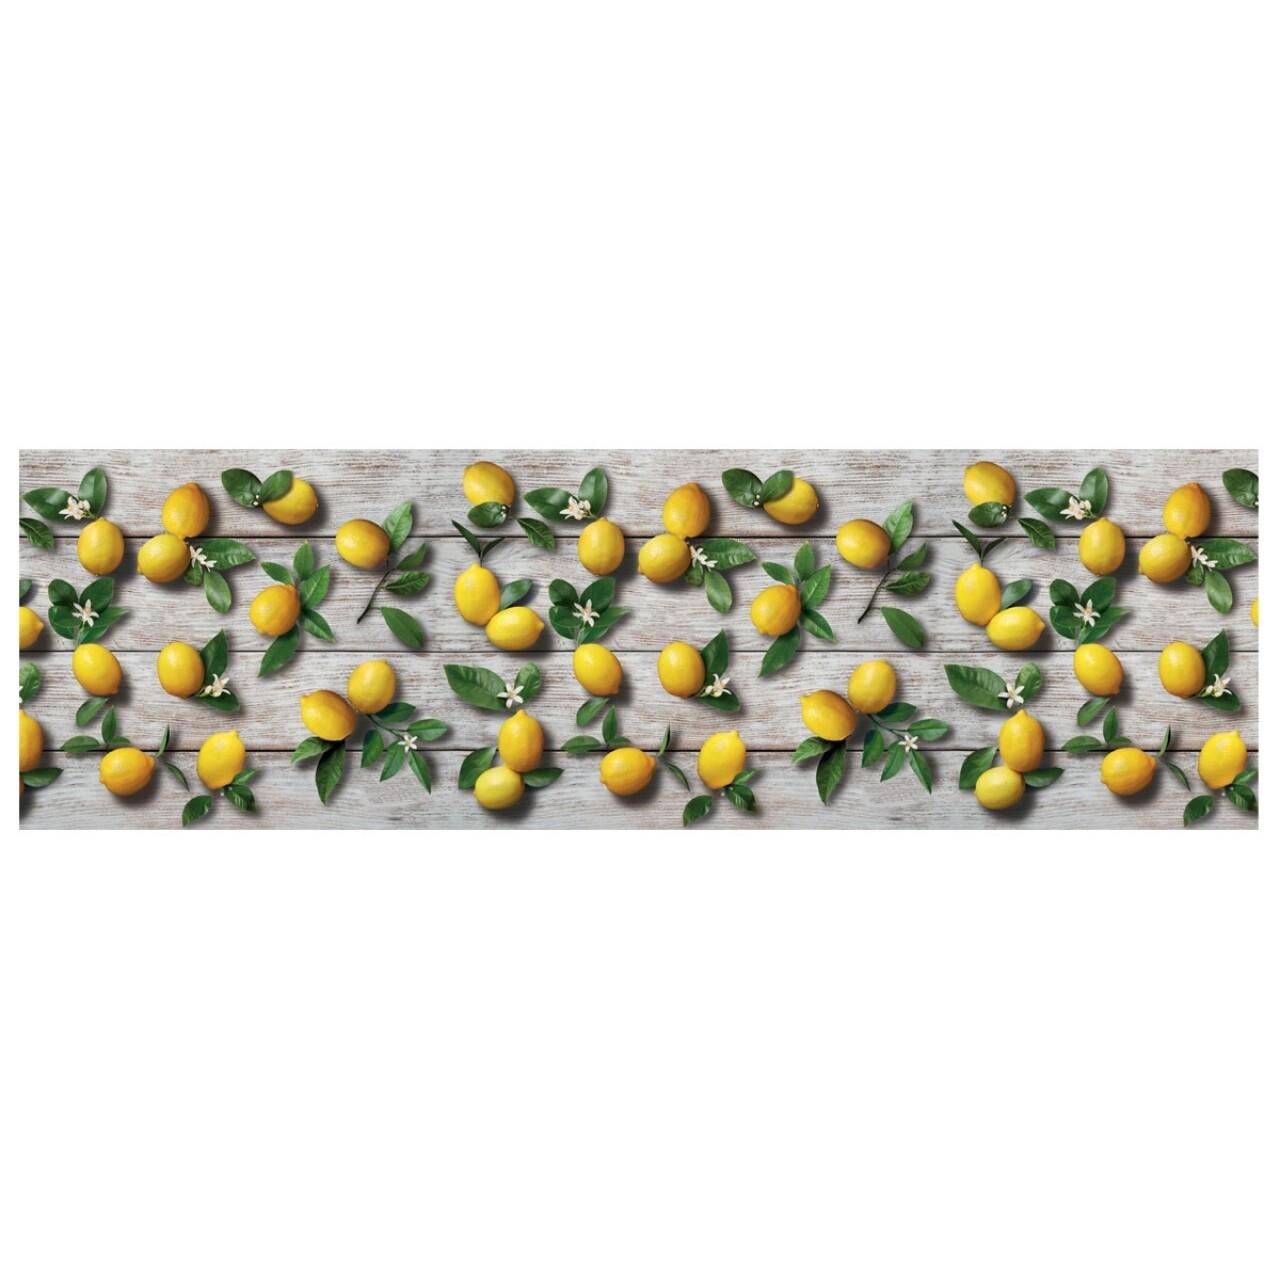 Covor rezistent Webtappeti Limoni 58 x 140 cm, gri/galben/verde